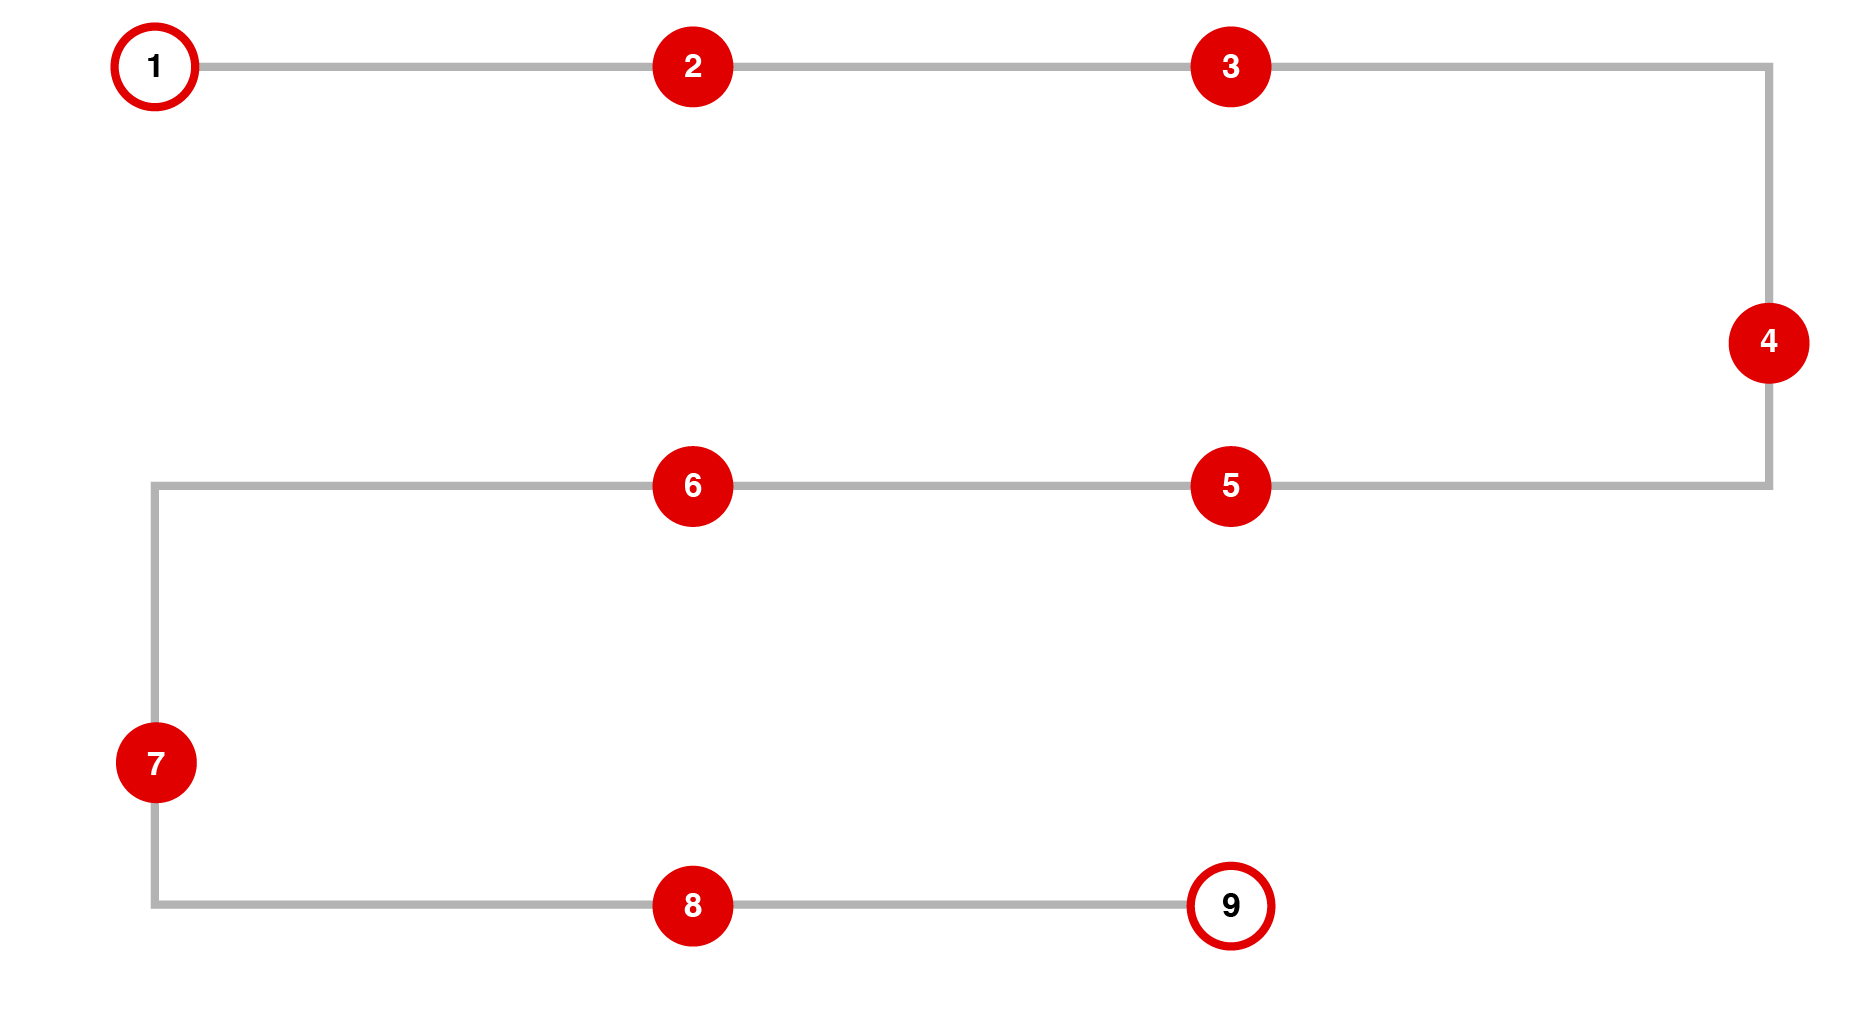 Timeline_Adjudication